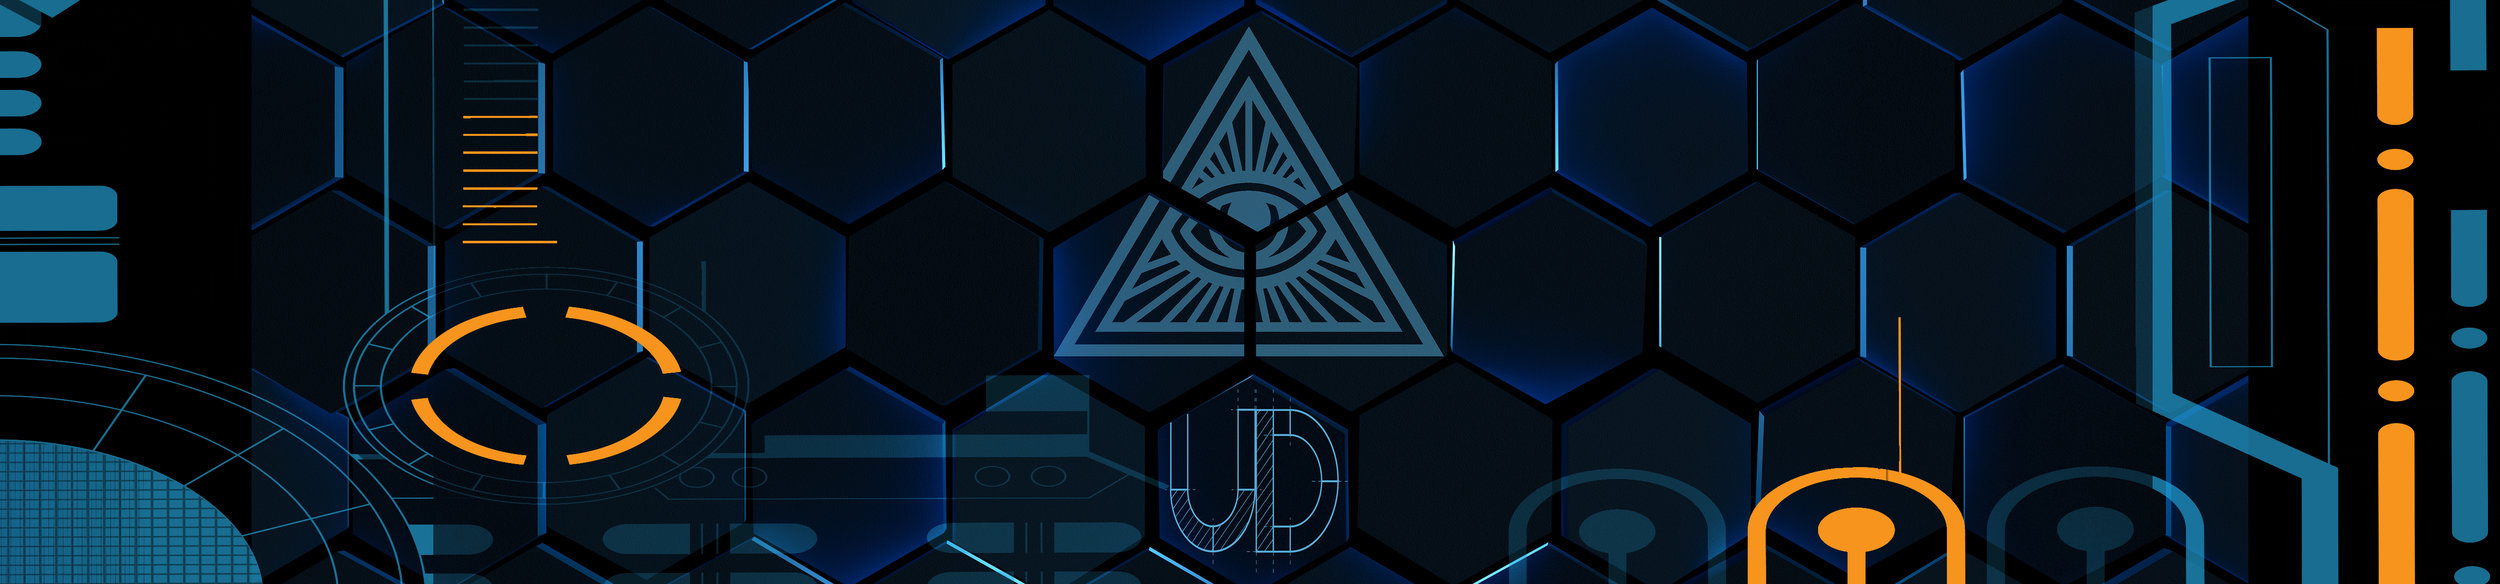 UD Prop Header.jpg